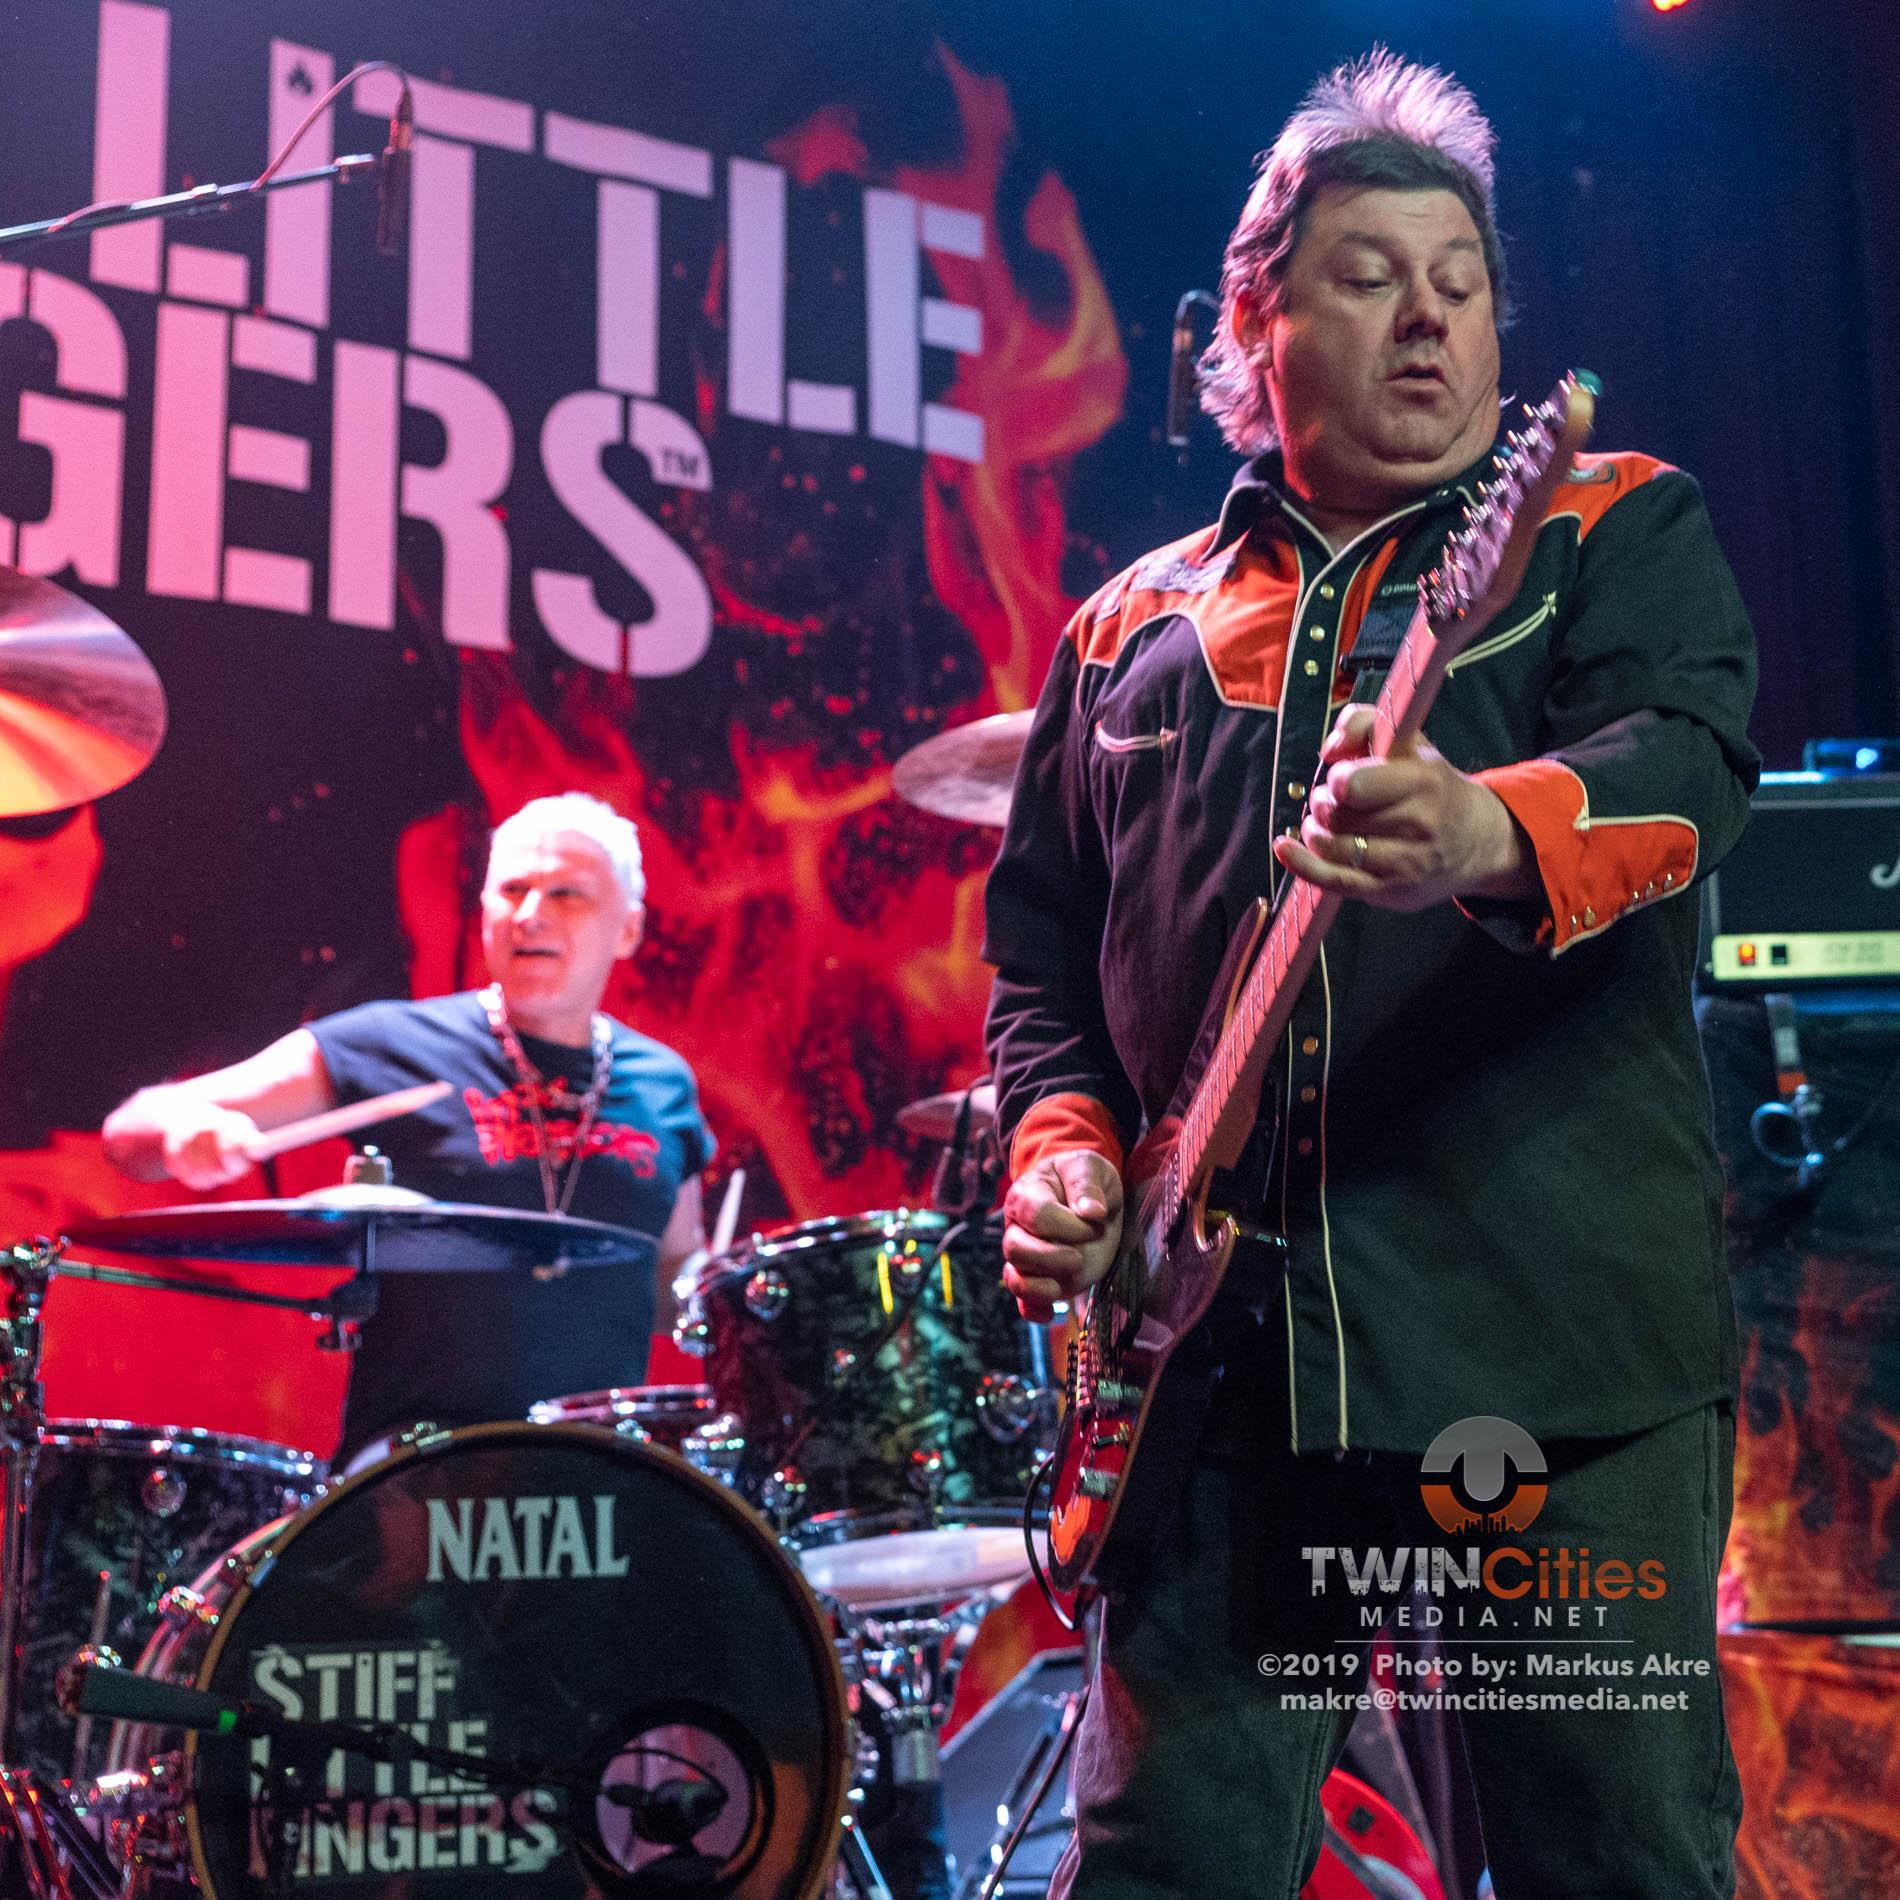 Stiff-Little-Fingers-12